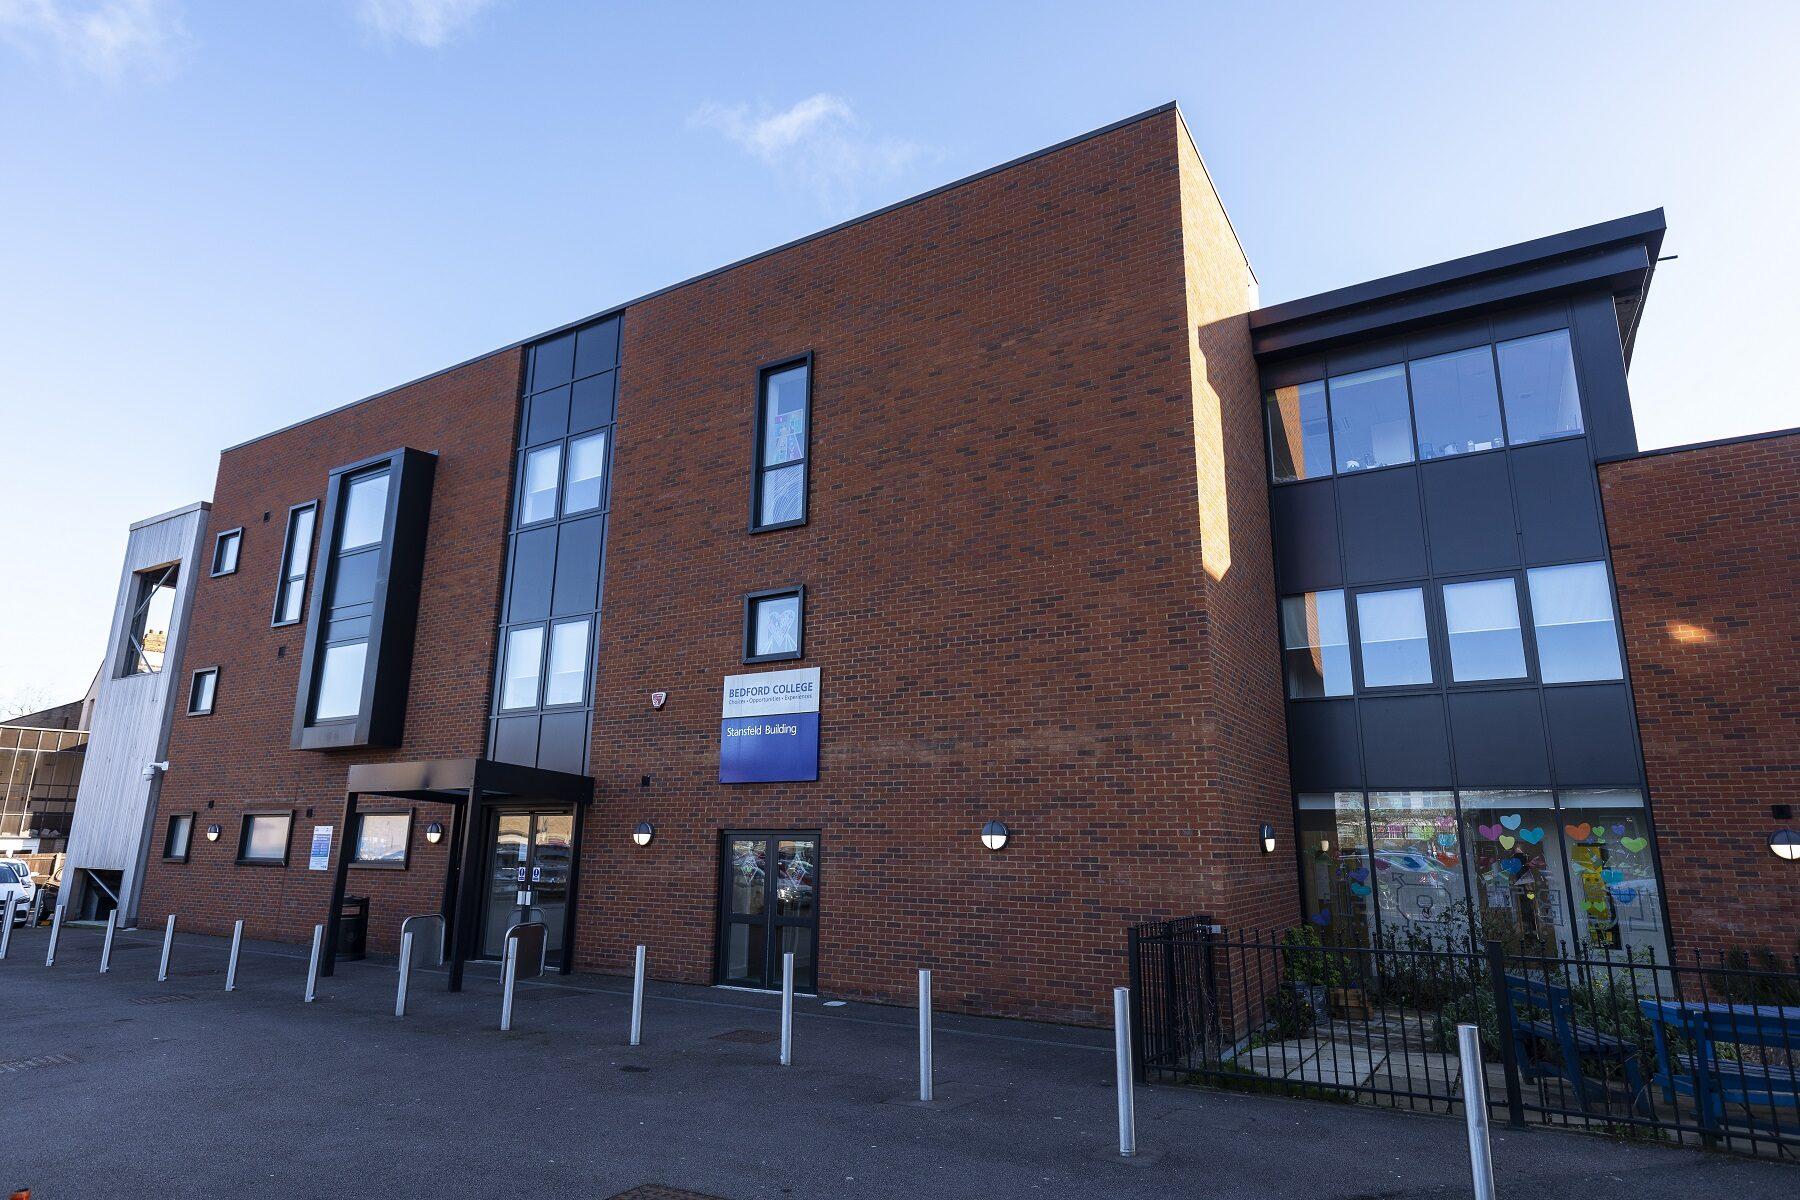 Bedford College Stansfeld building